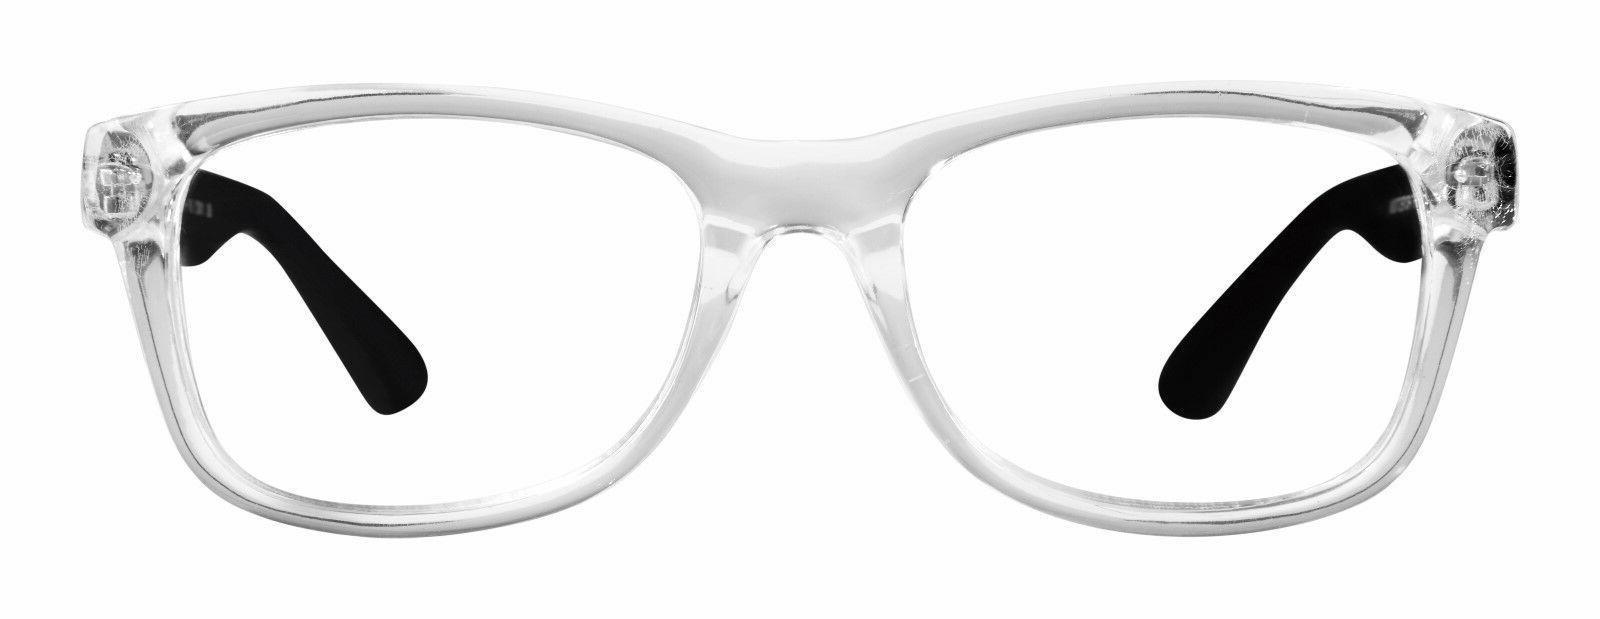 BLUE Blocking FASHION Reader Gaming Glasses SLATED